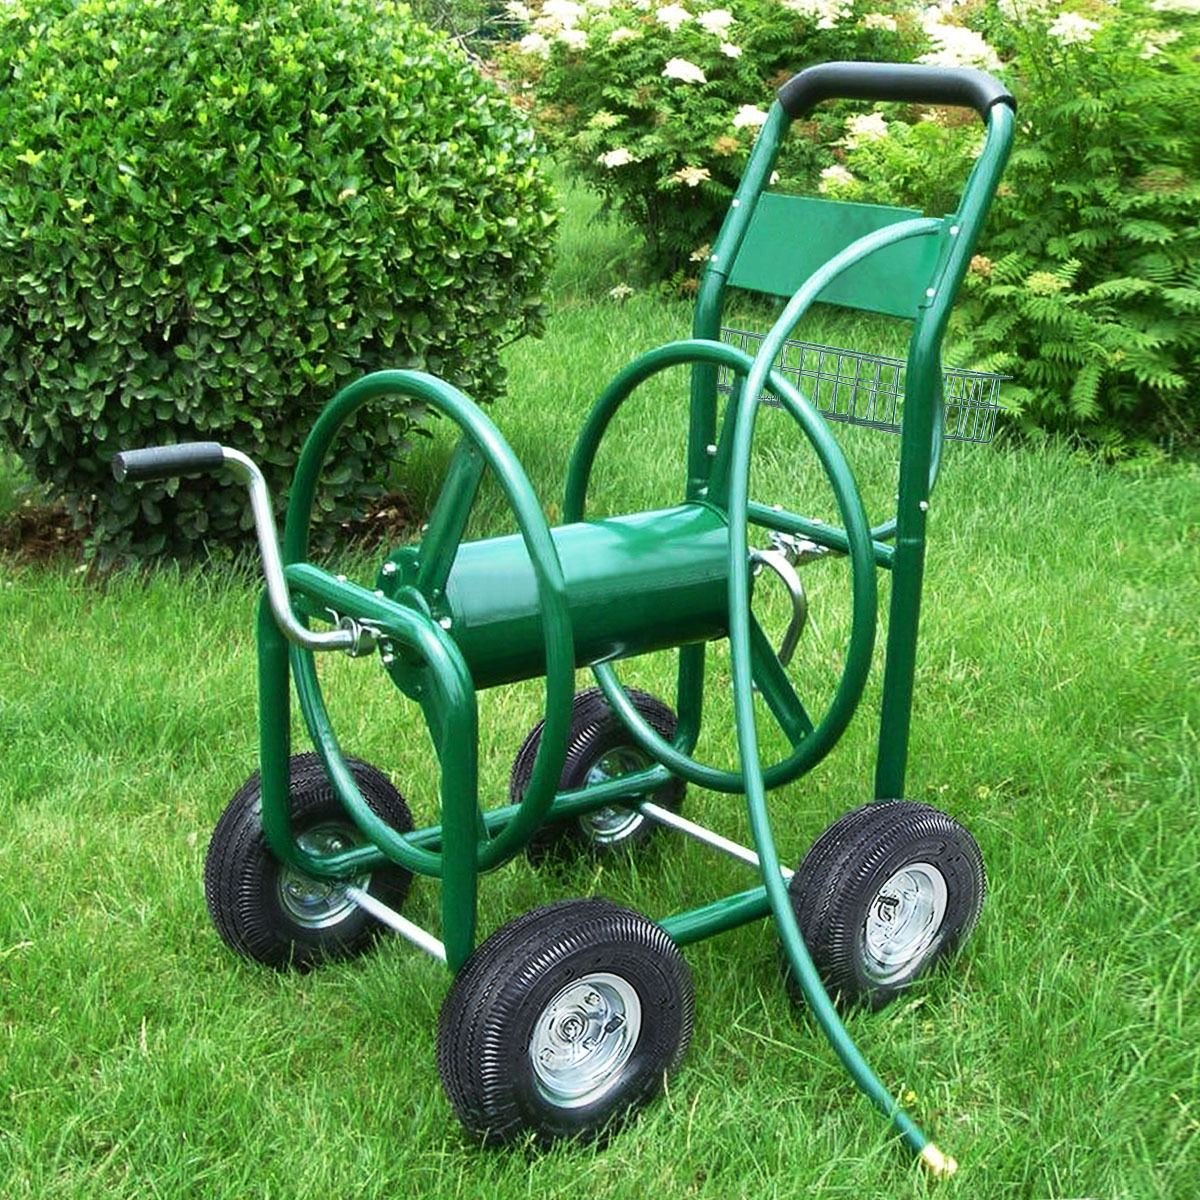 MasterPanel - Garden Water Hose Reel Cart 300FT Outdoor Heavy Duty Yard Planting W/Basket #TP3417 by MasterPanel